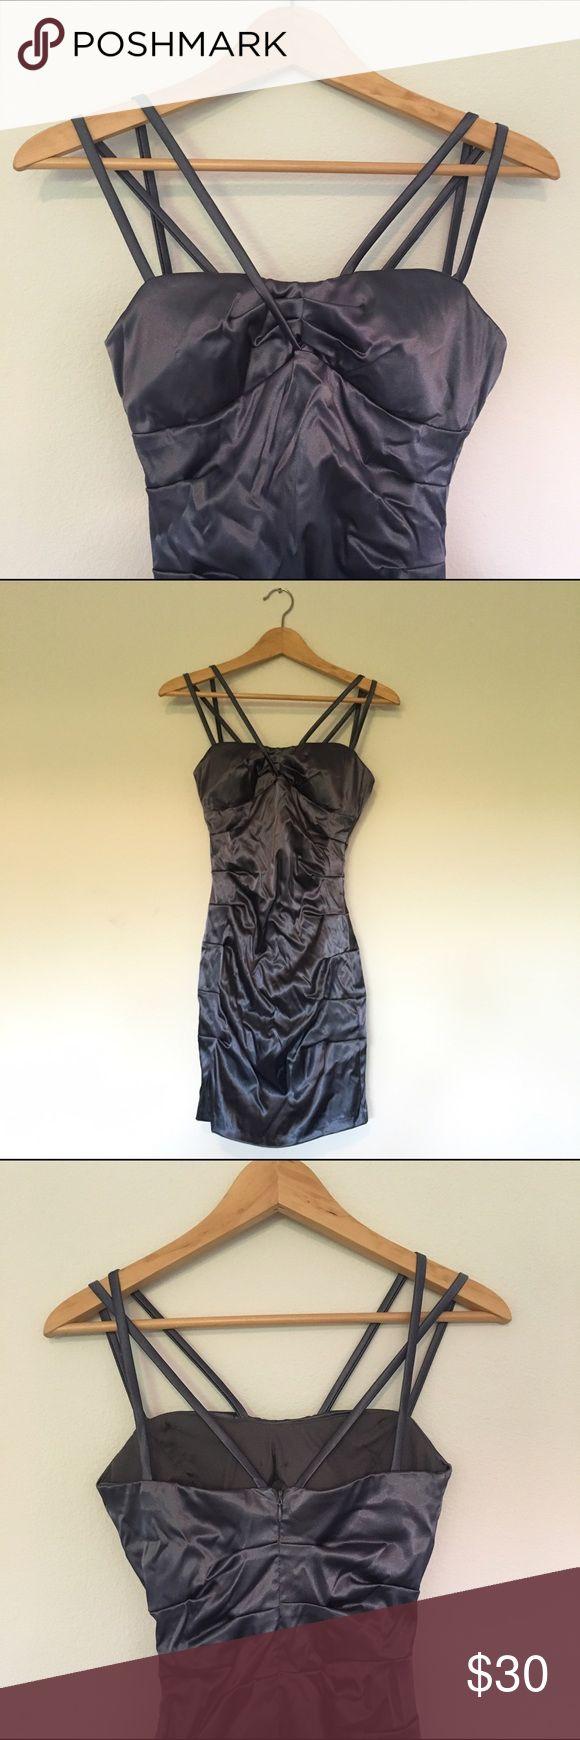 B. Darlin silver bodycon dress Tight fitting silver satin mini dress; slightly worn B. Darlin Dresses Mini